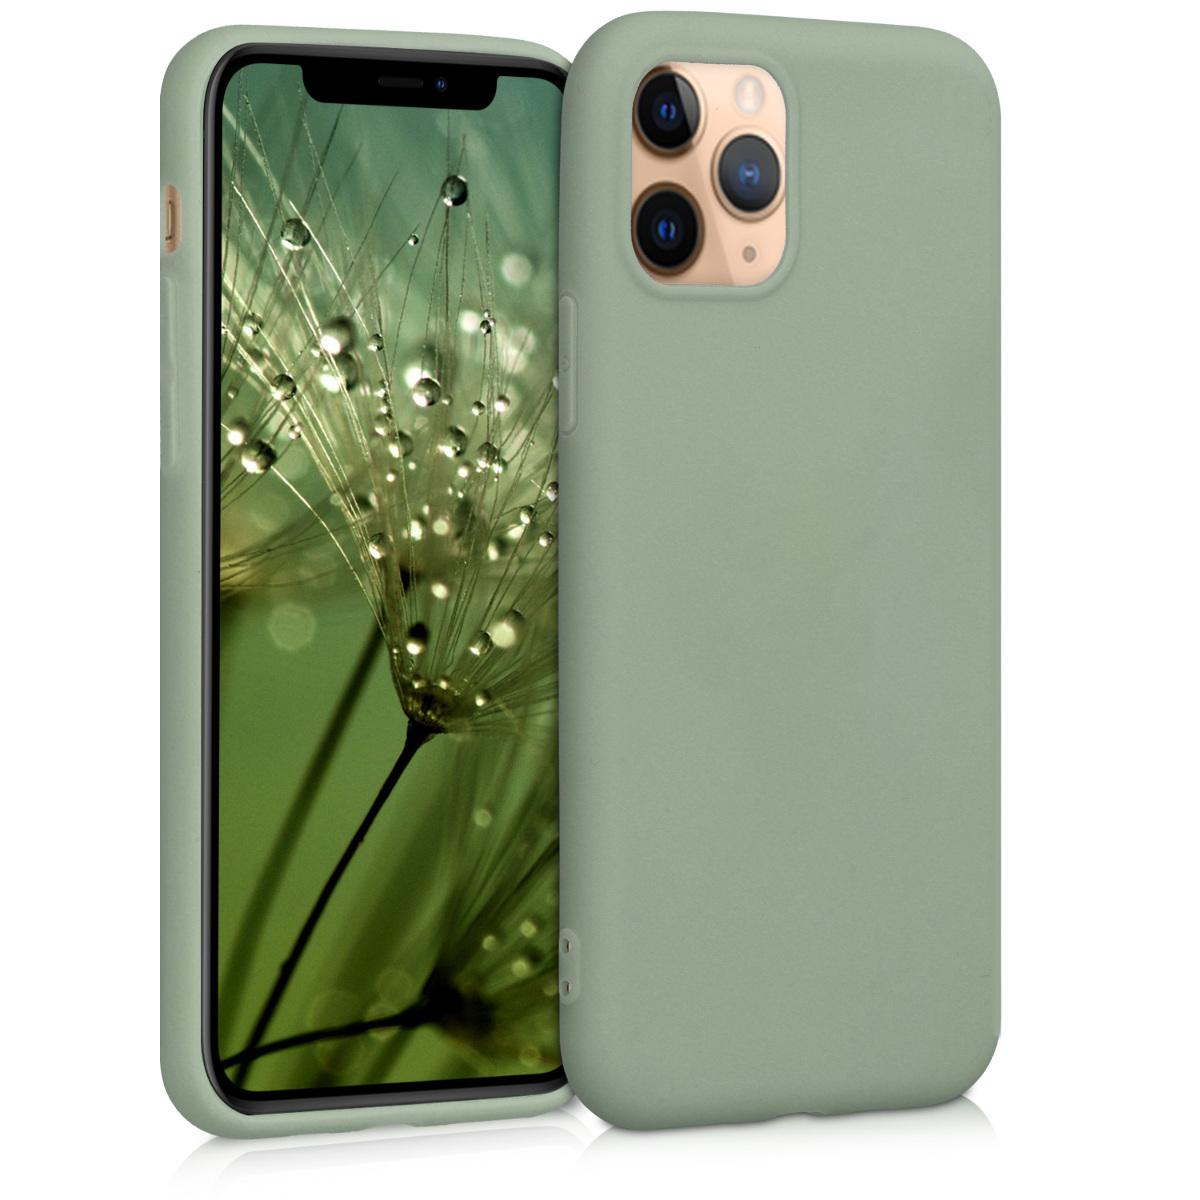 KW Θήκη Σιλικόνης Apple iPhone 11 Pro - Gray Green (49788.172)